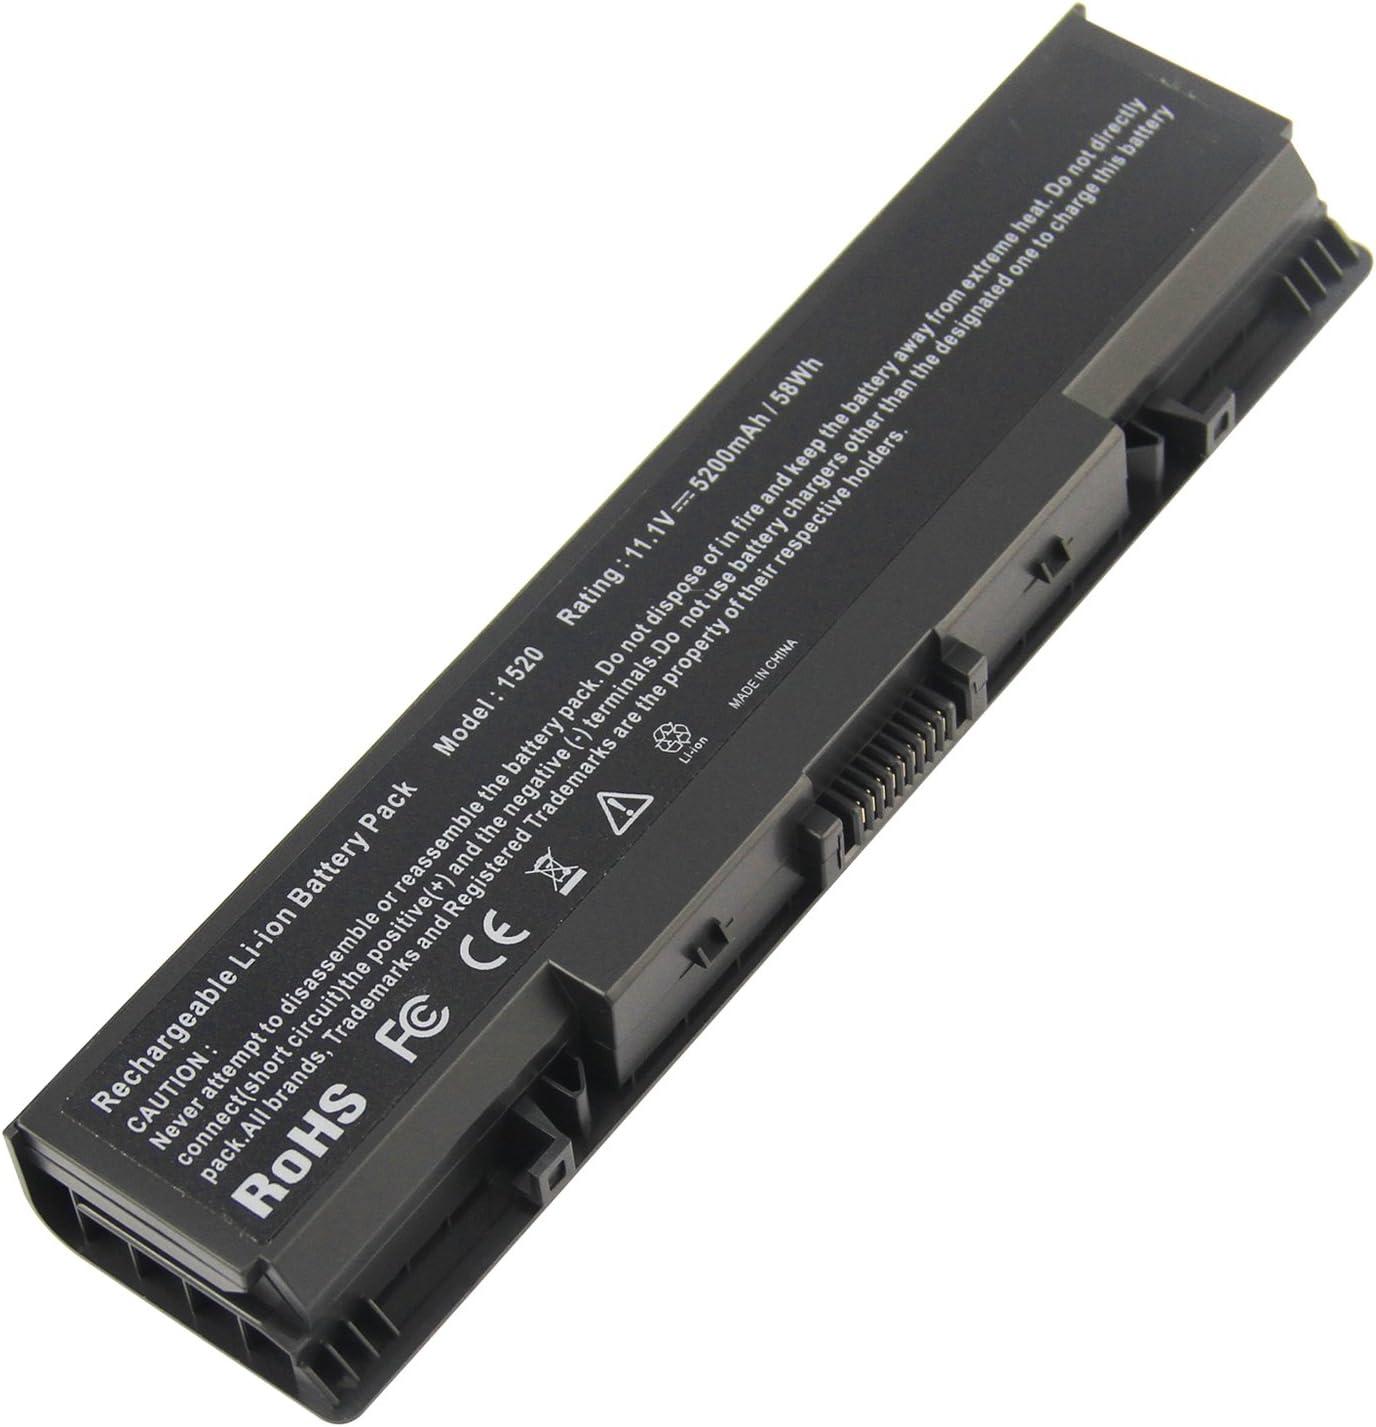 Futurebatt 6-Cell Laptop Battery for Dell Vostro 1500 1700 Inspiron 1520 1521 1720 1721 530s Notebook (Not Fit Vostro 1520 Vostro 1720) GK479 FK890 New